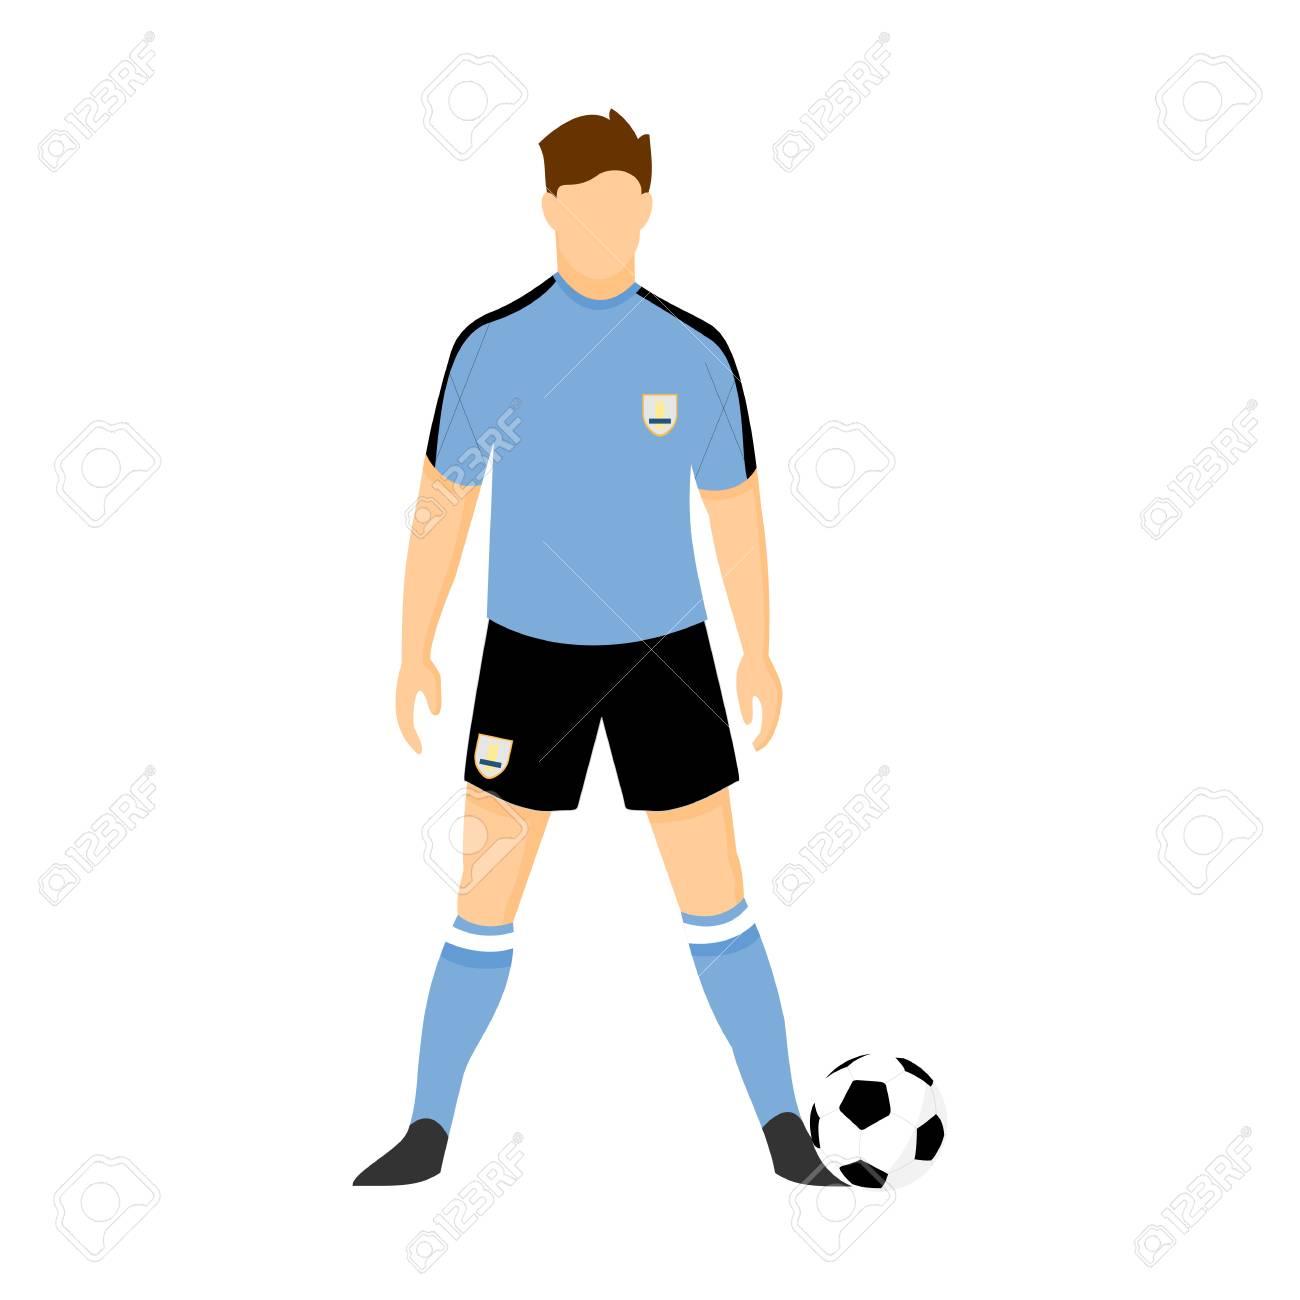 88c7101db54 Uruguay Football Uniform National Team Illustration Graphic Design Stock  Vector - 99273633